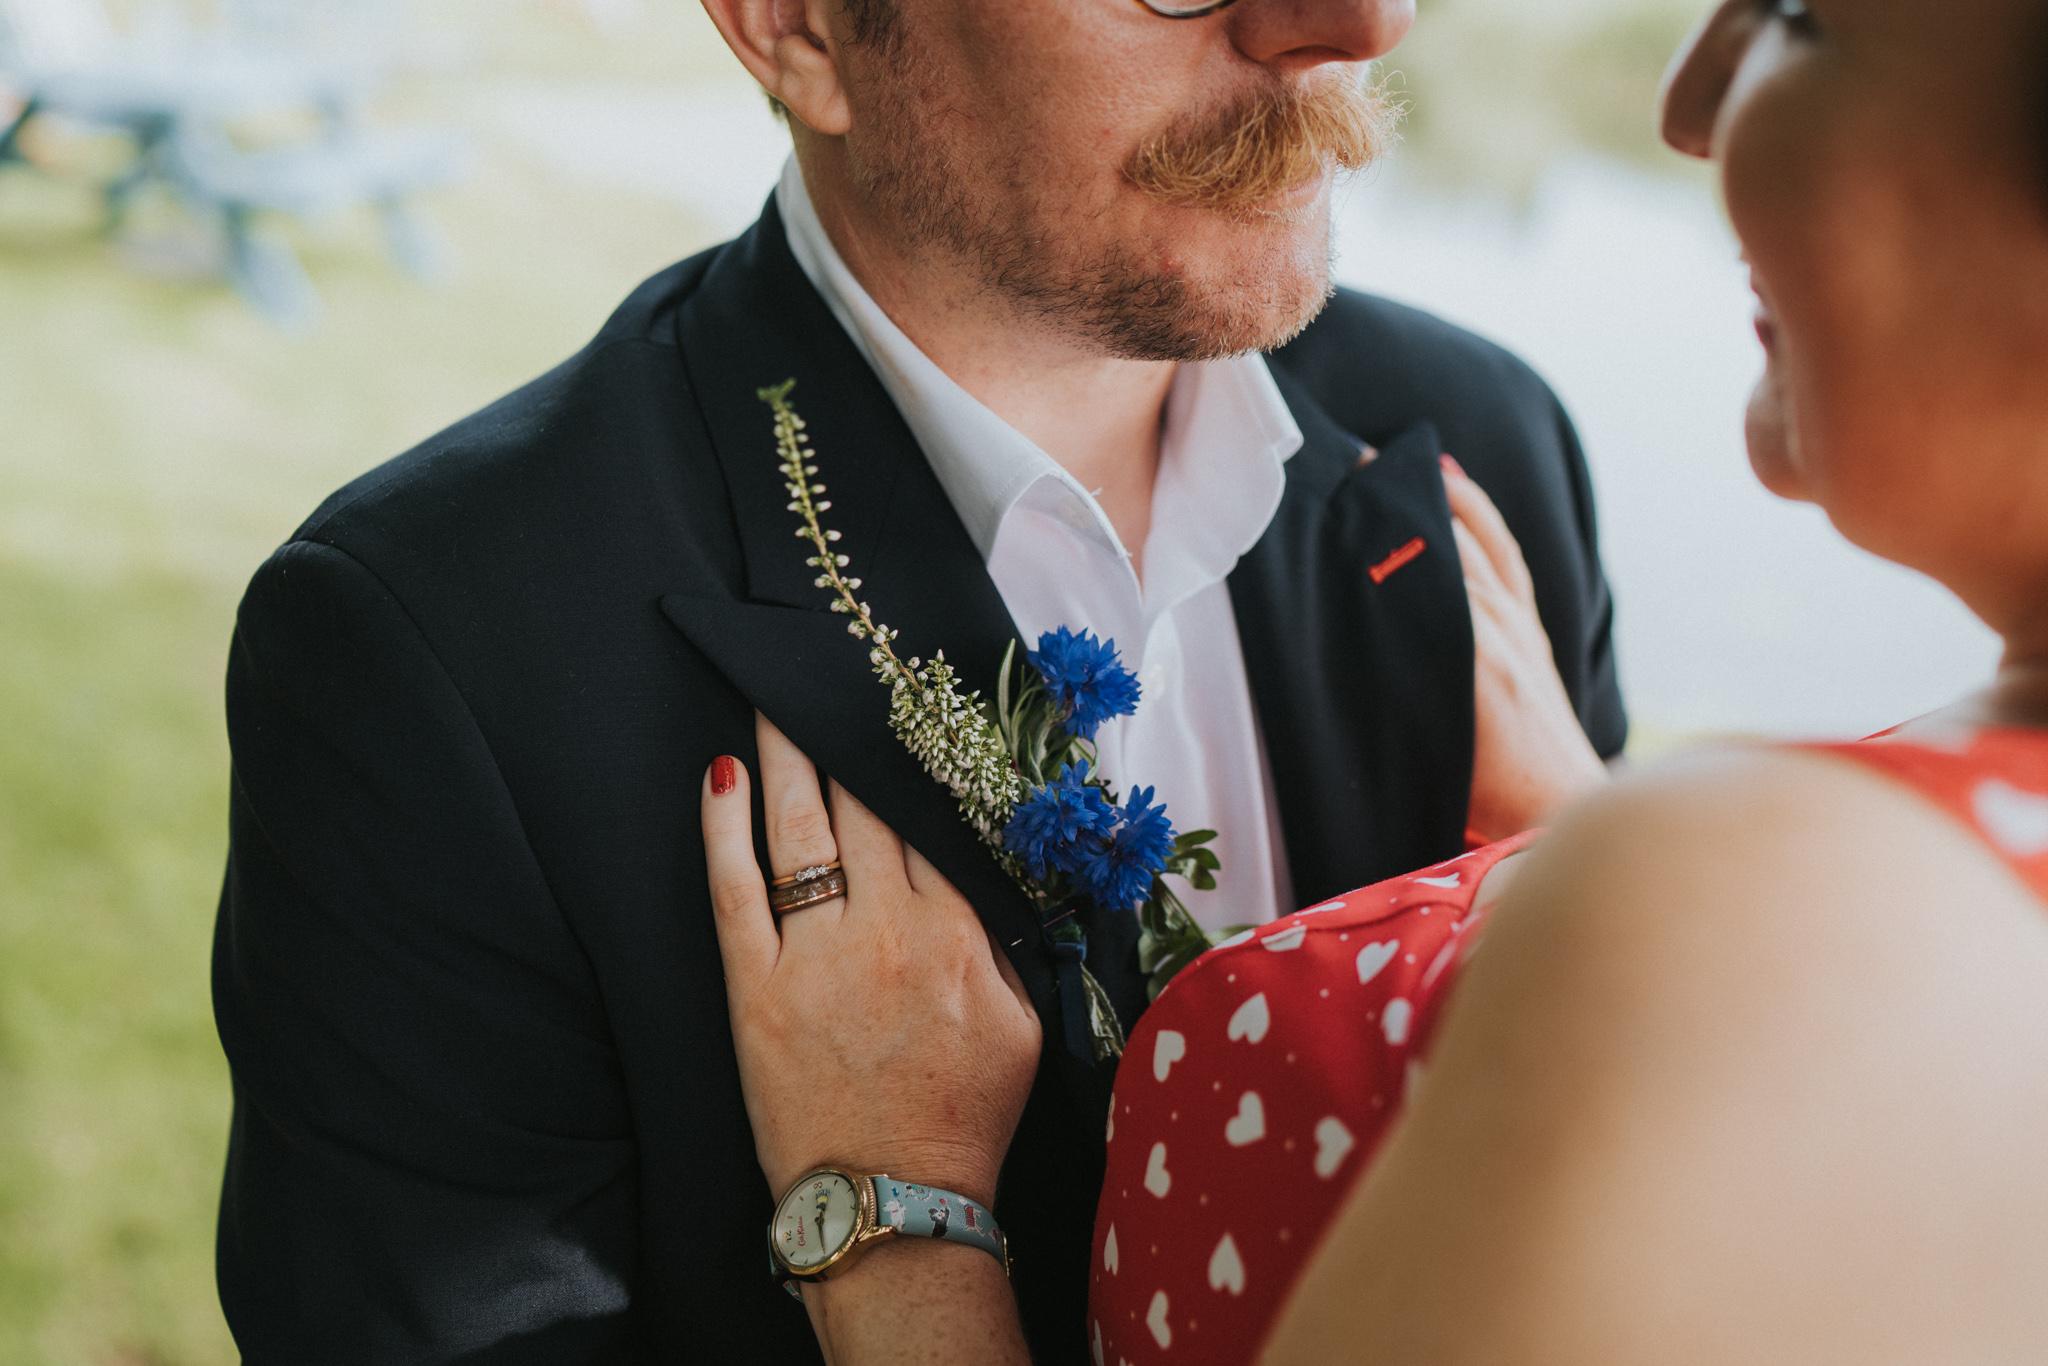 hannah-anthony-thorpeness-retro-diy-50s-wedding-grace-elizabeth-colchester-essex-alternative-wedding-lifestyle-photographer-essex-suffolk-norfolk-devon (35 of 39).jpg